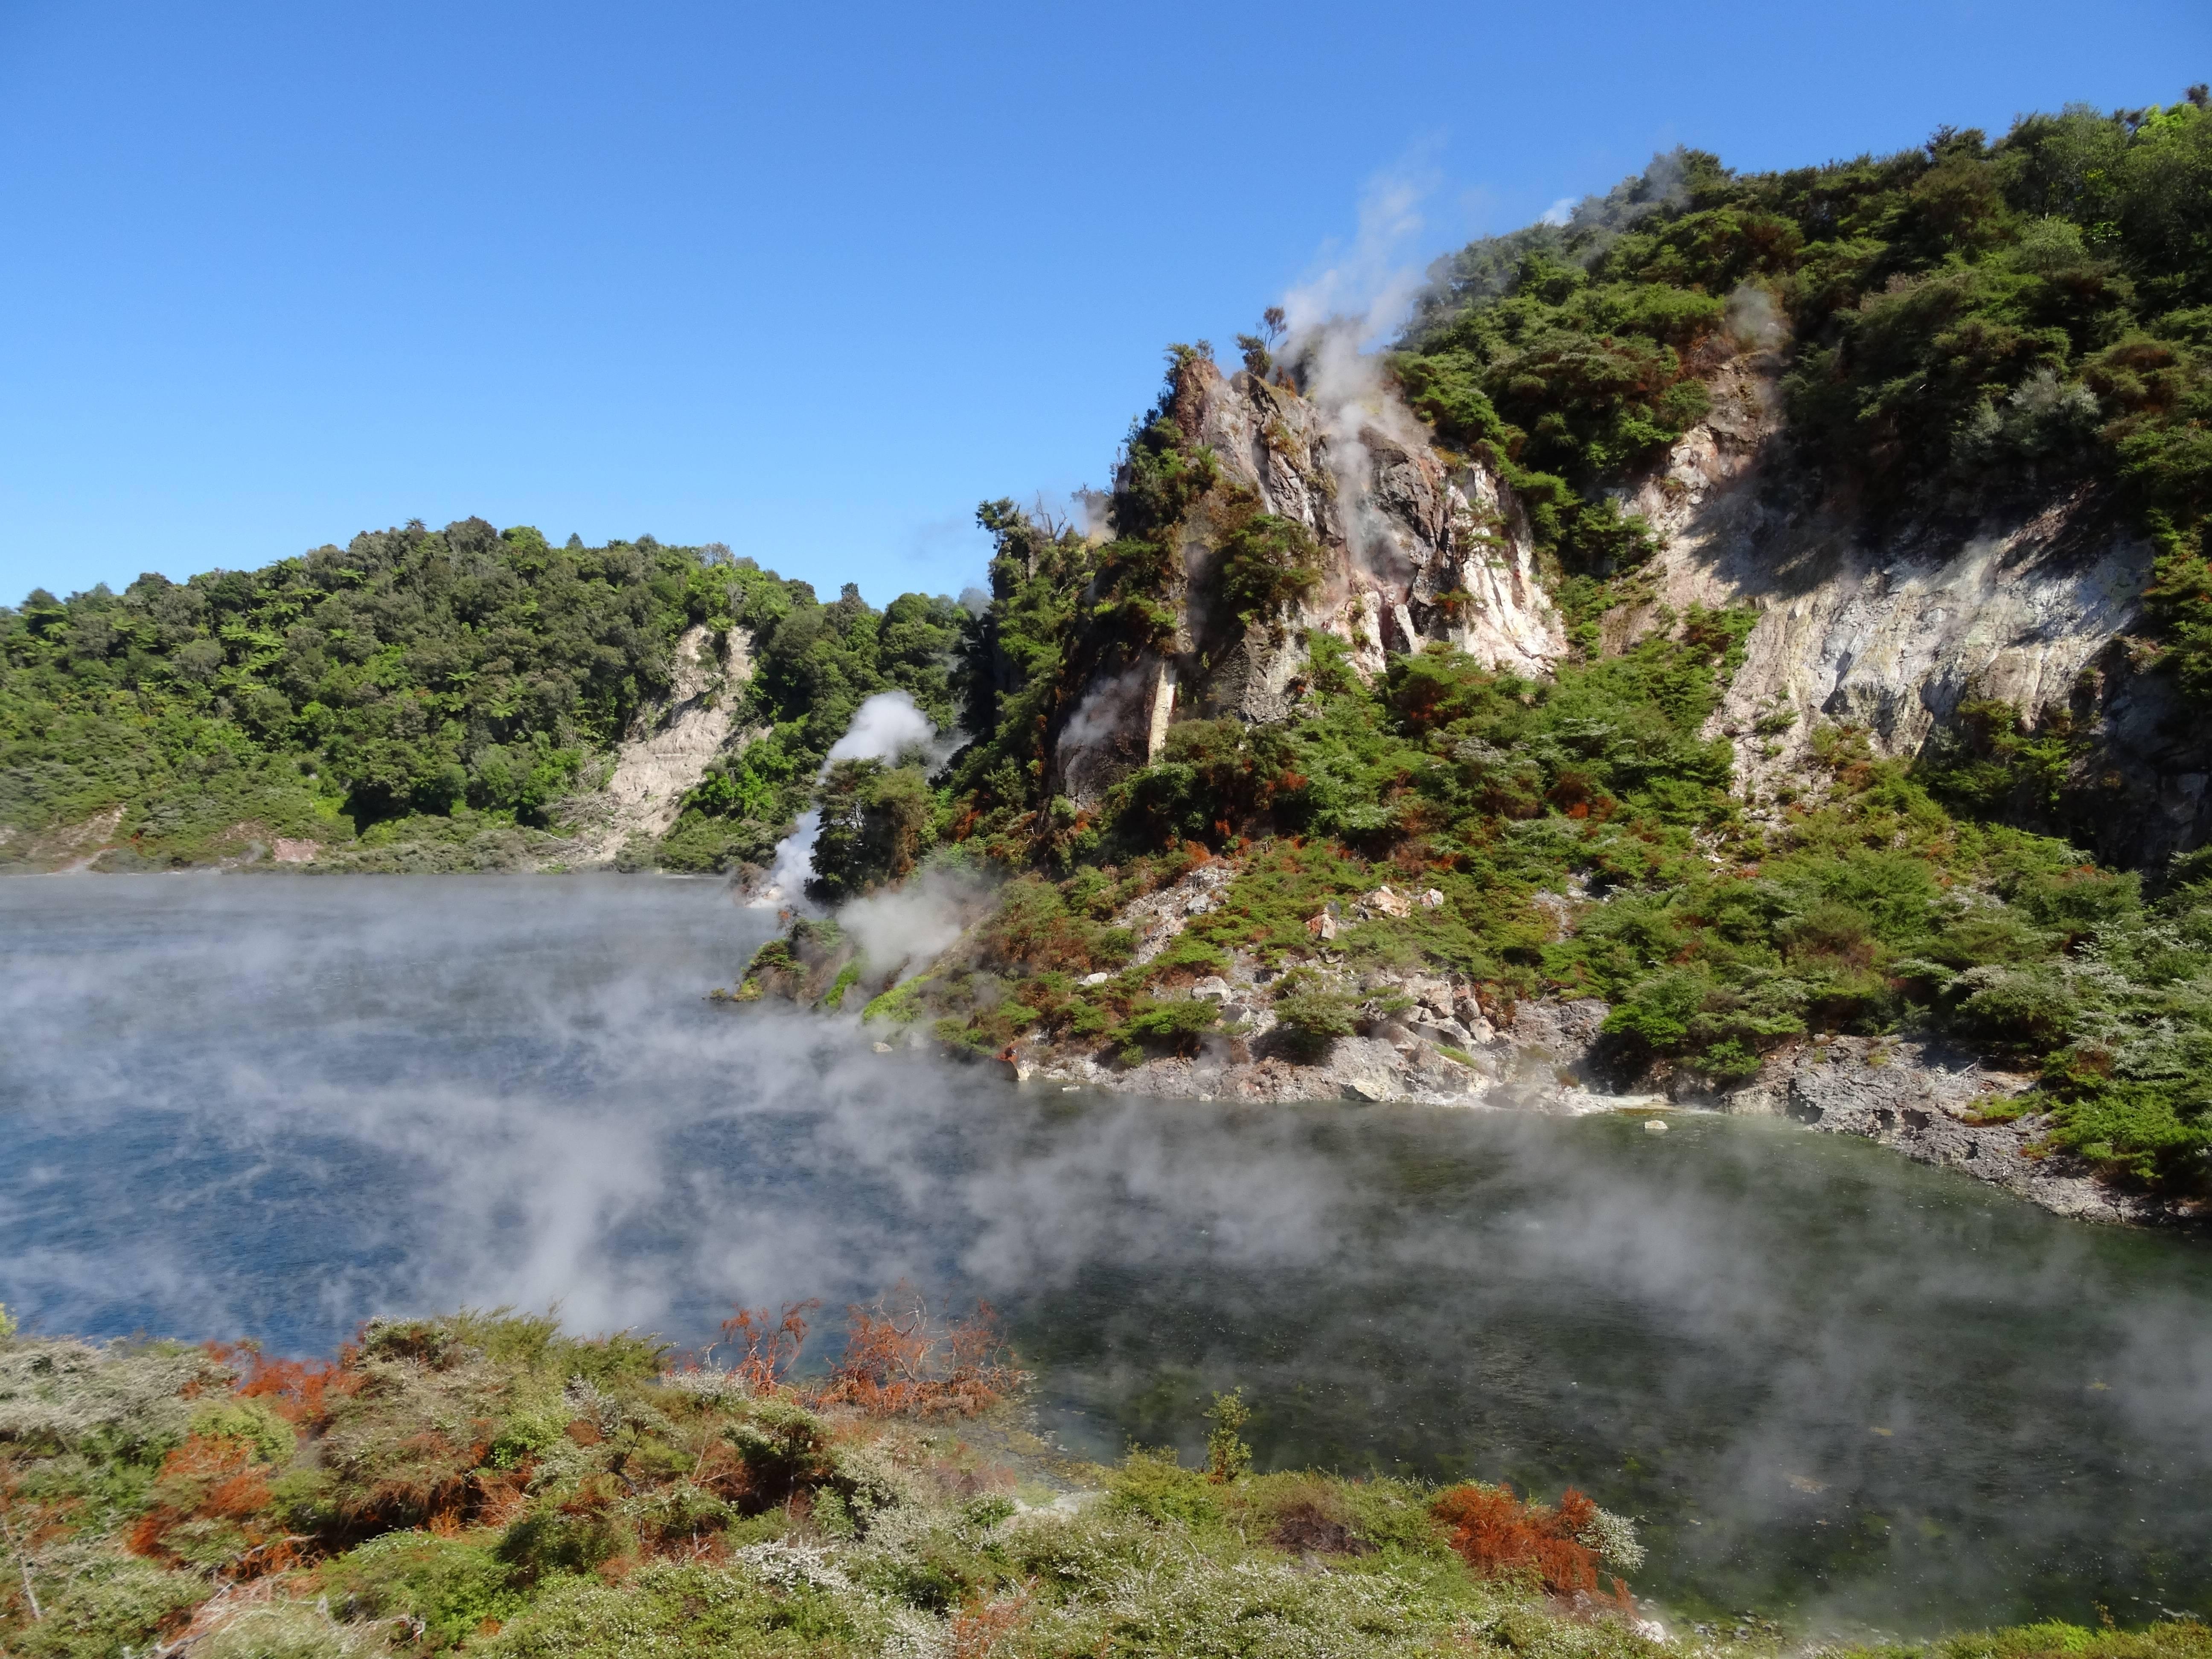 Photo 2: Waimangu Volcanic Valley, Rotorua, Nouvelle-Zélande